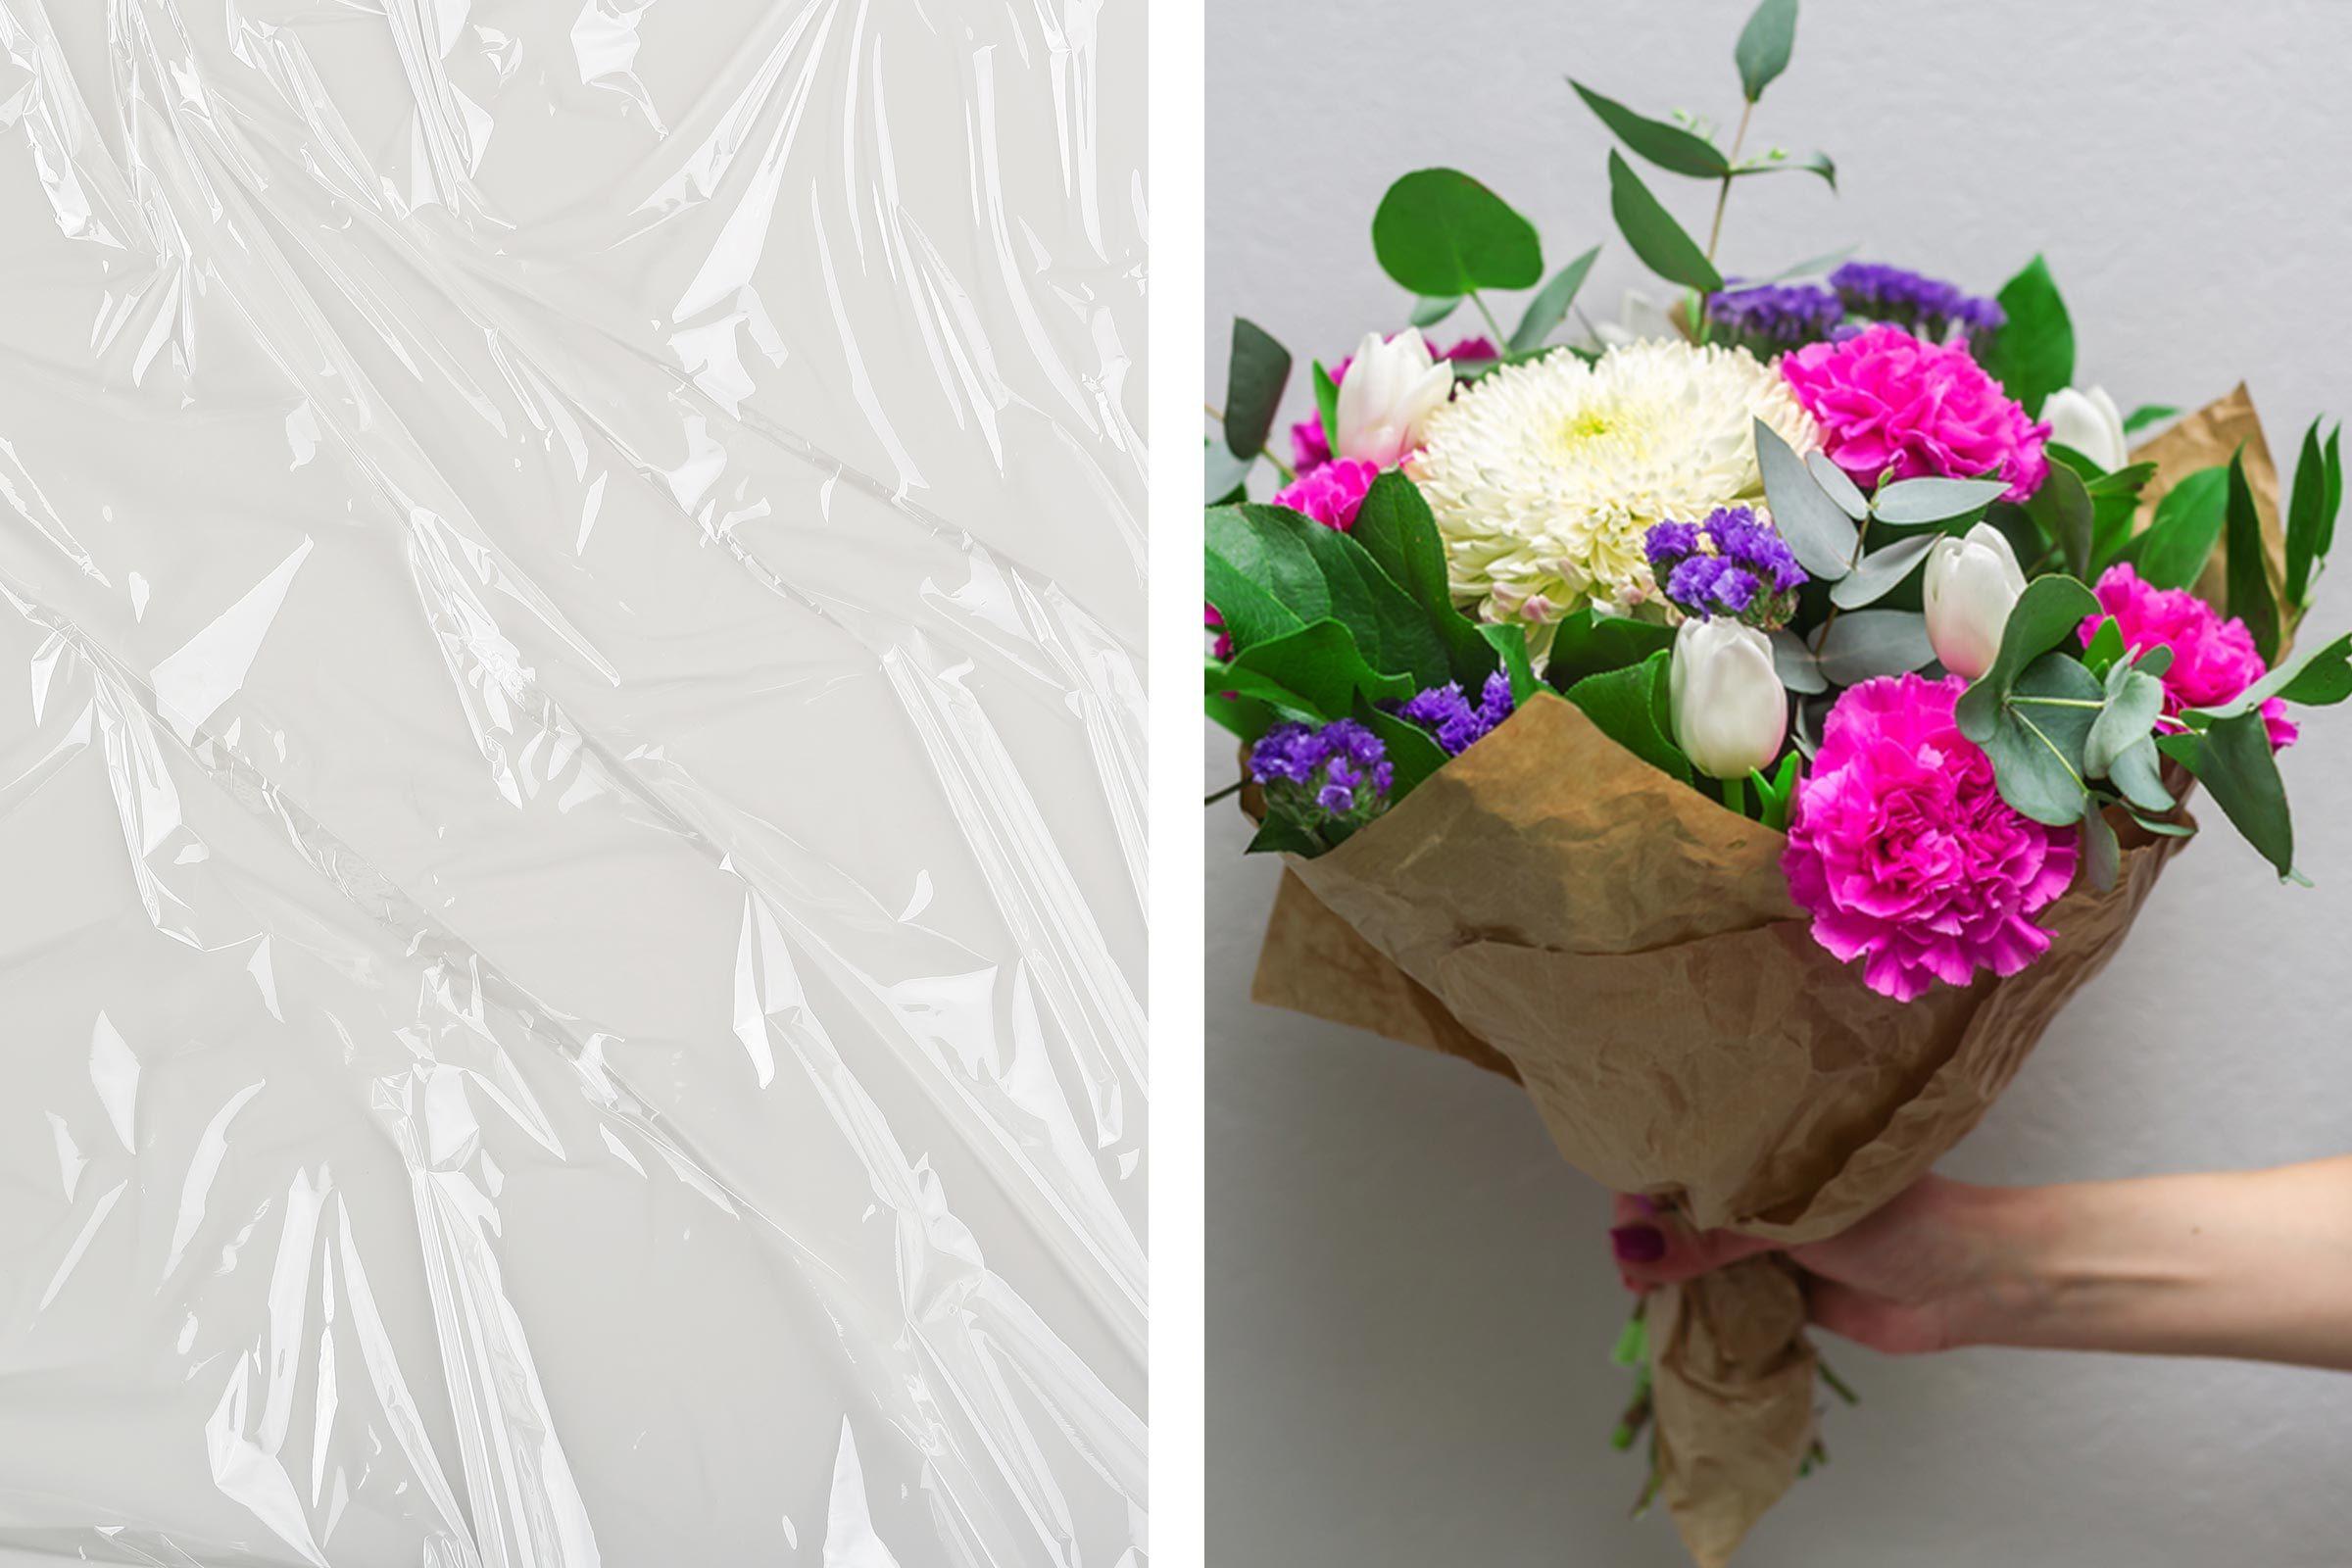 plastic wrap flowers